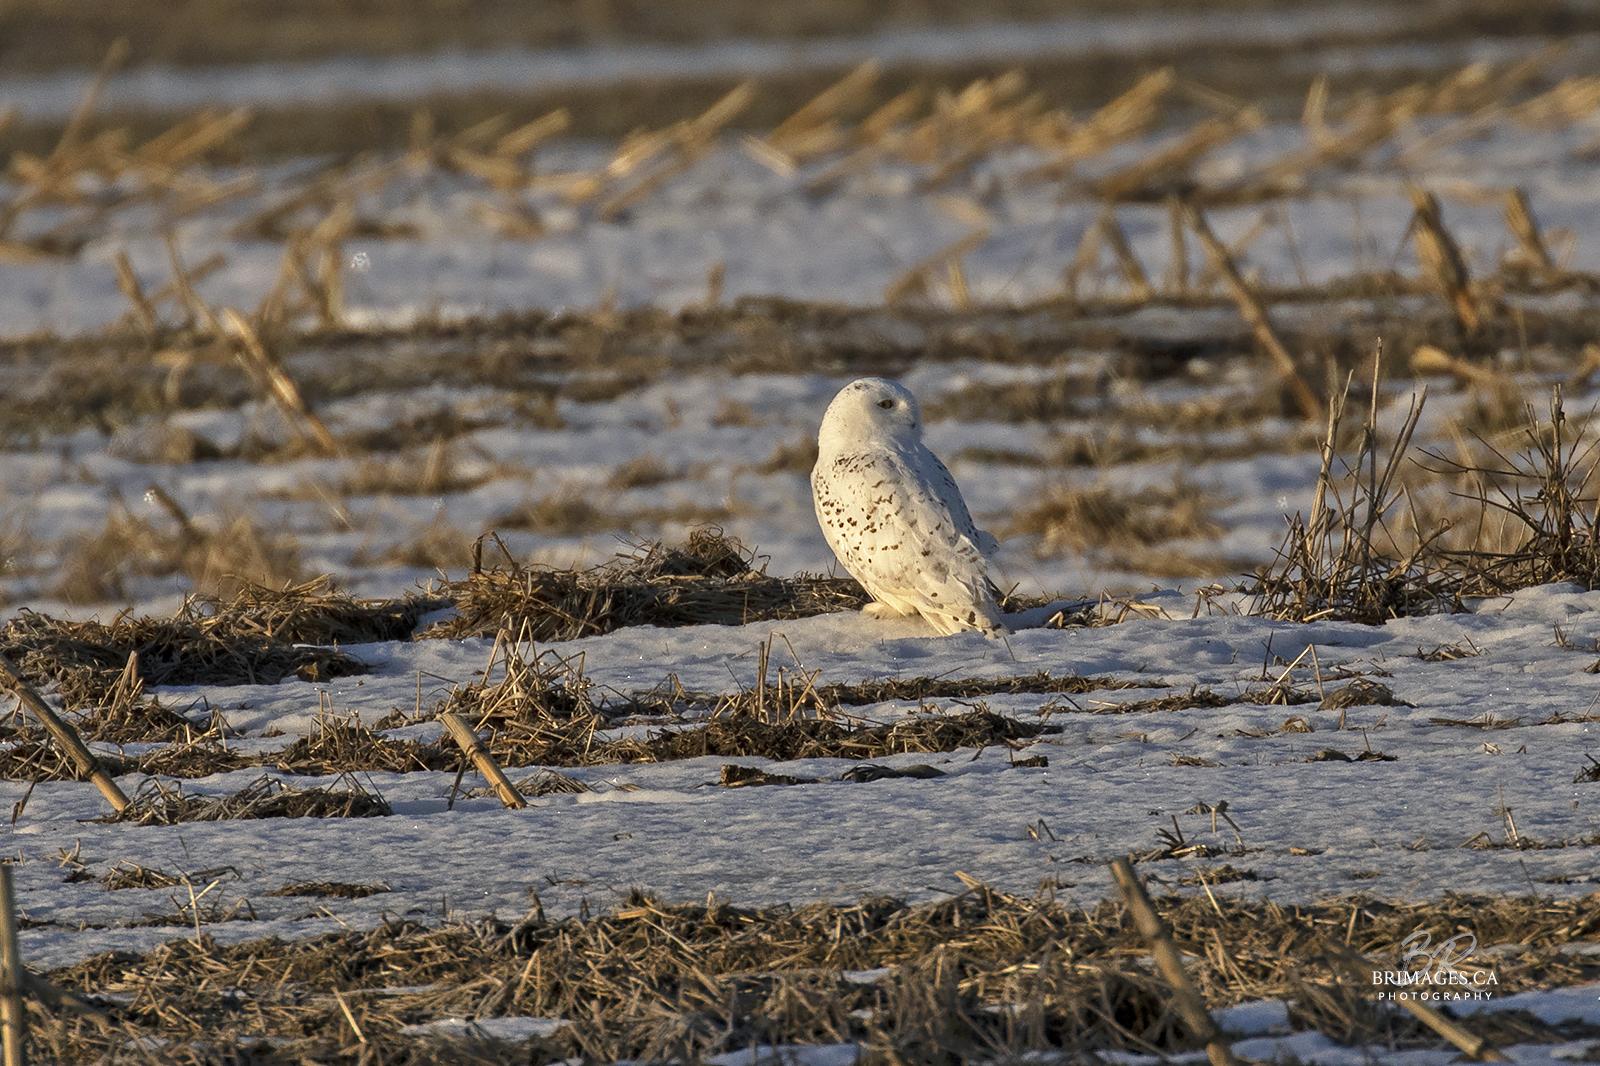 snowy-owl-ground-new-brunswick-3-BRimages.ca